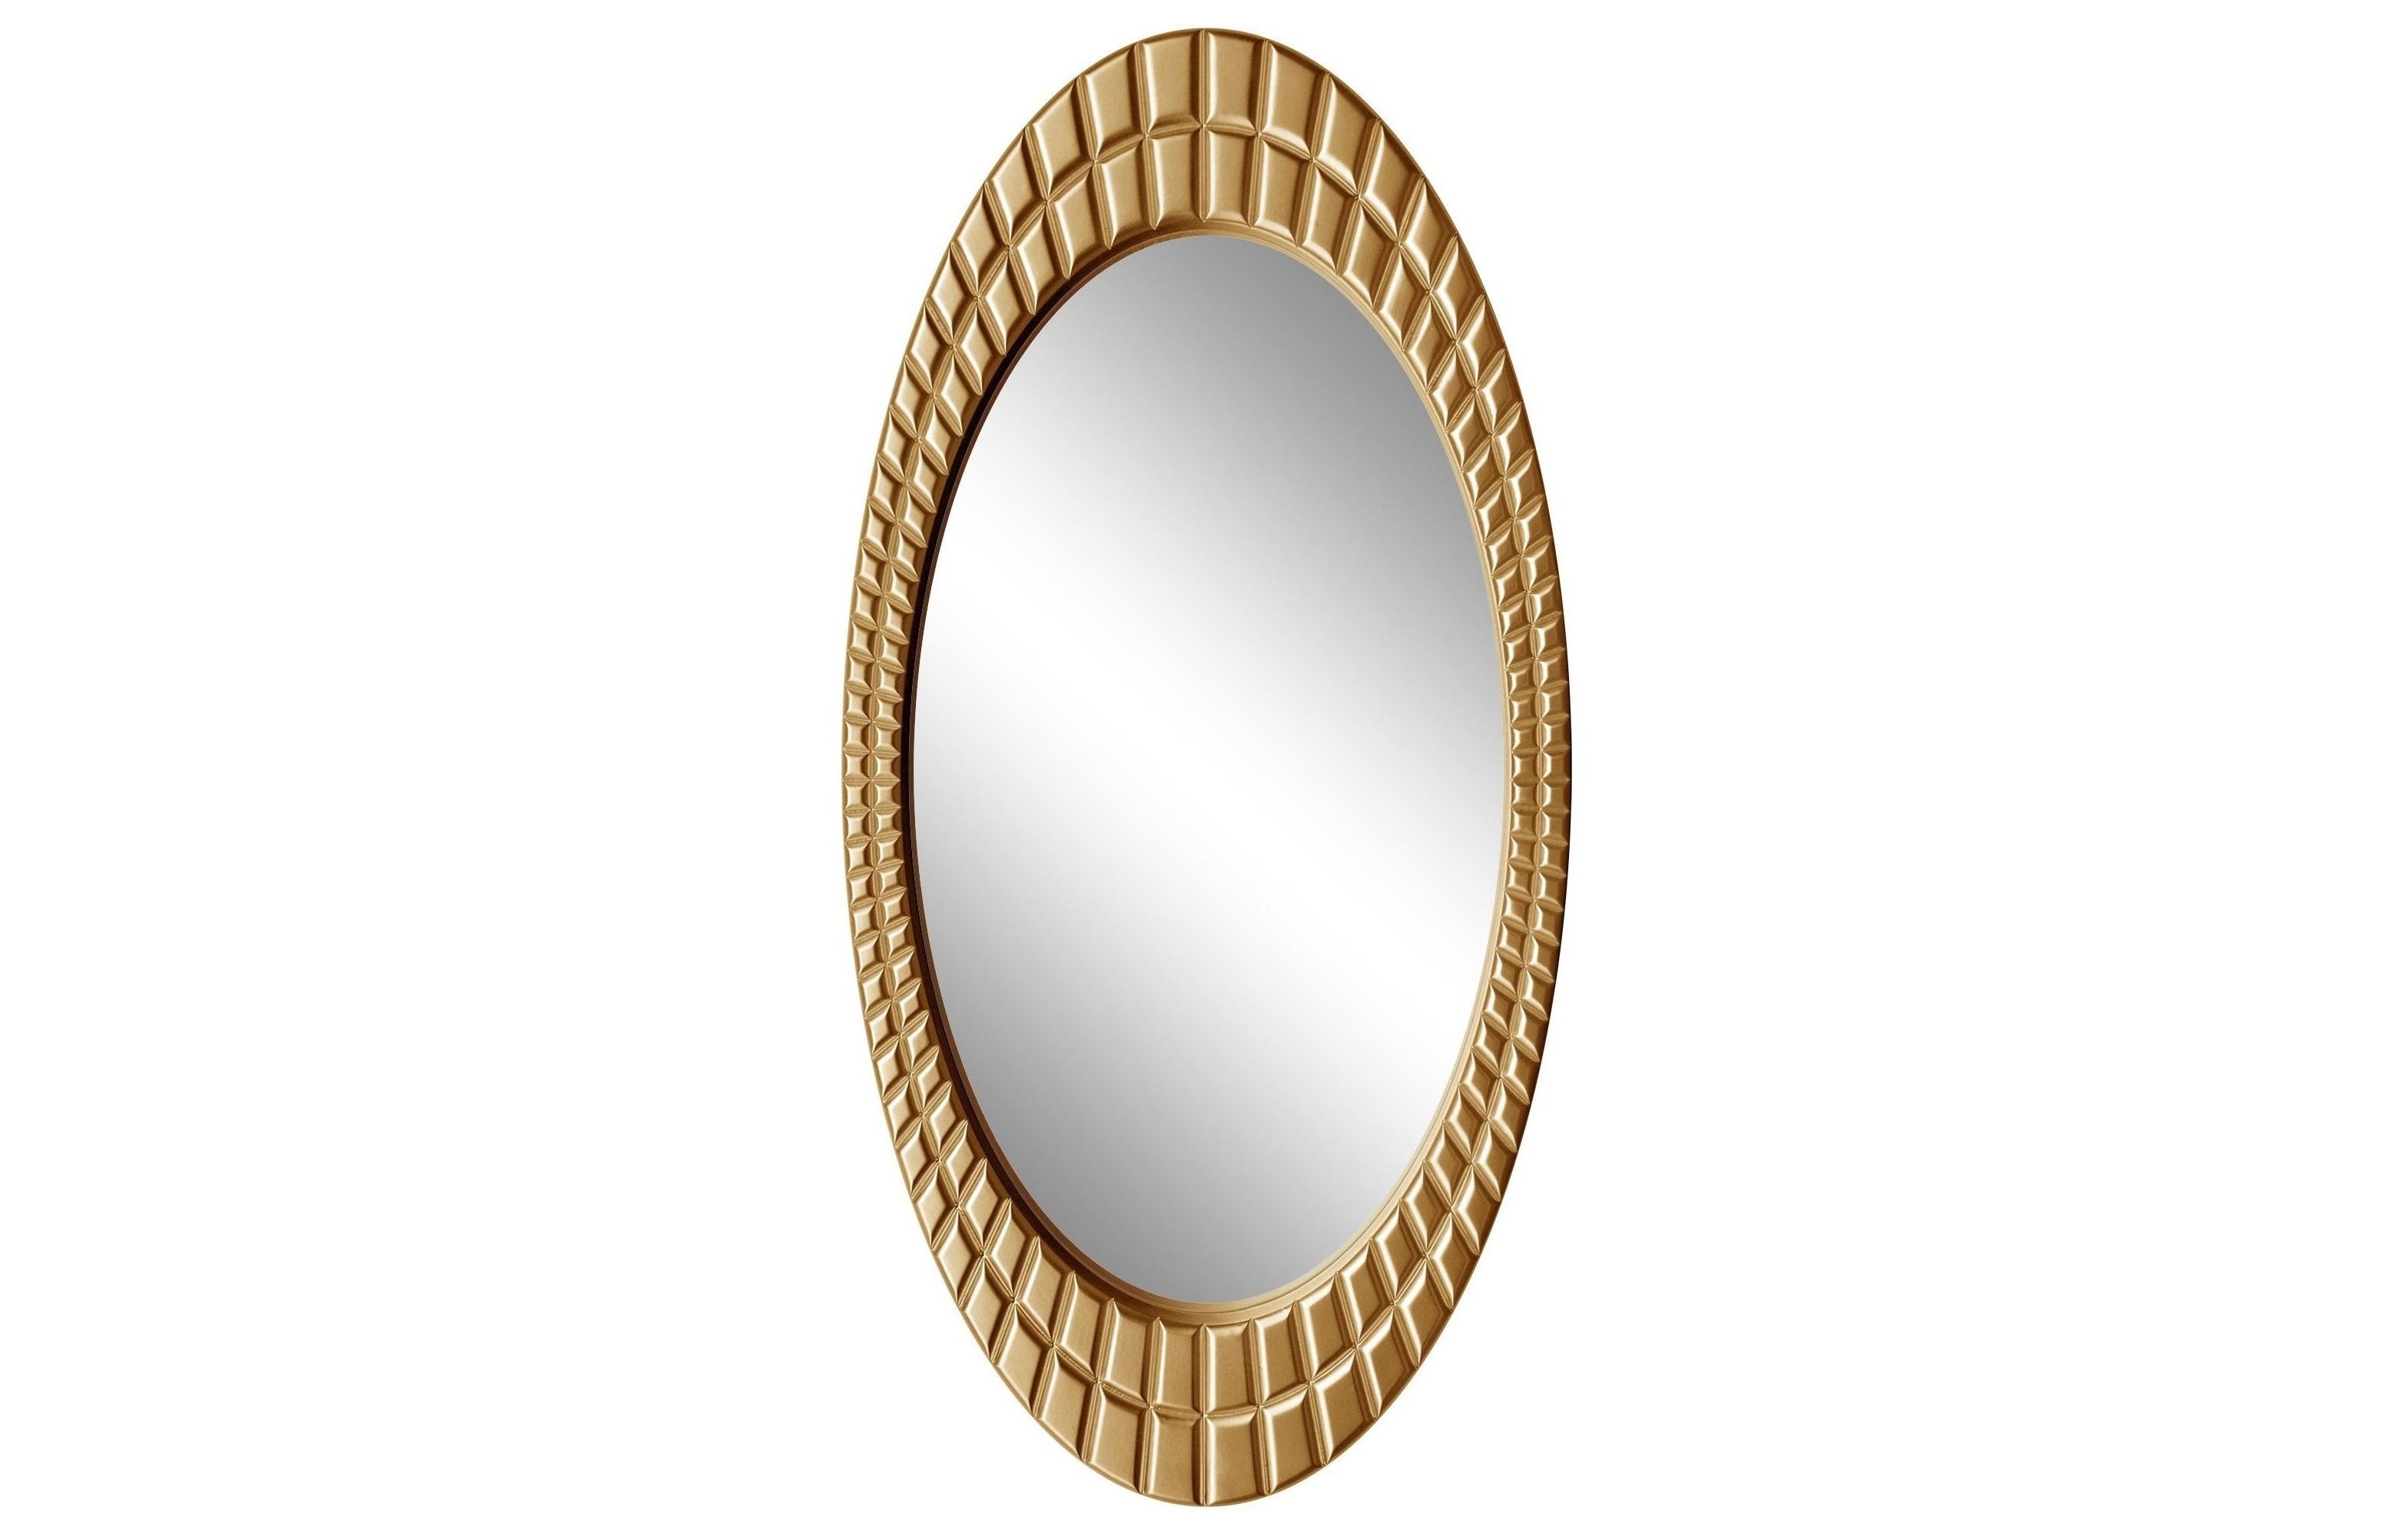 Зеркало Reeforma 15431624 от thefurnish